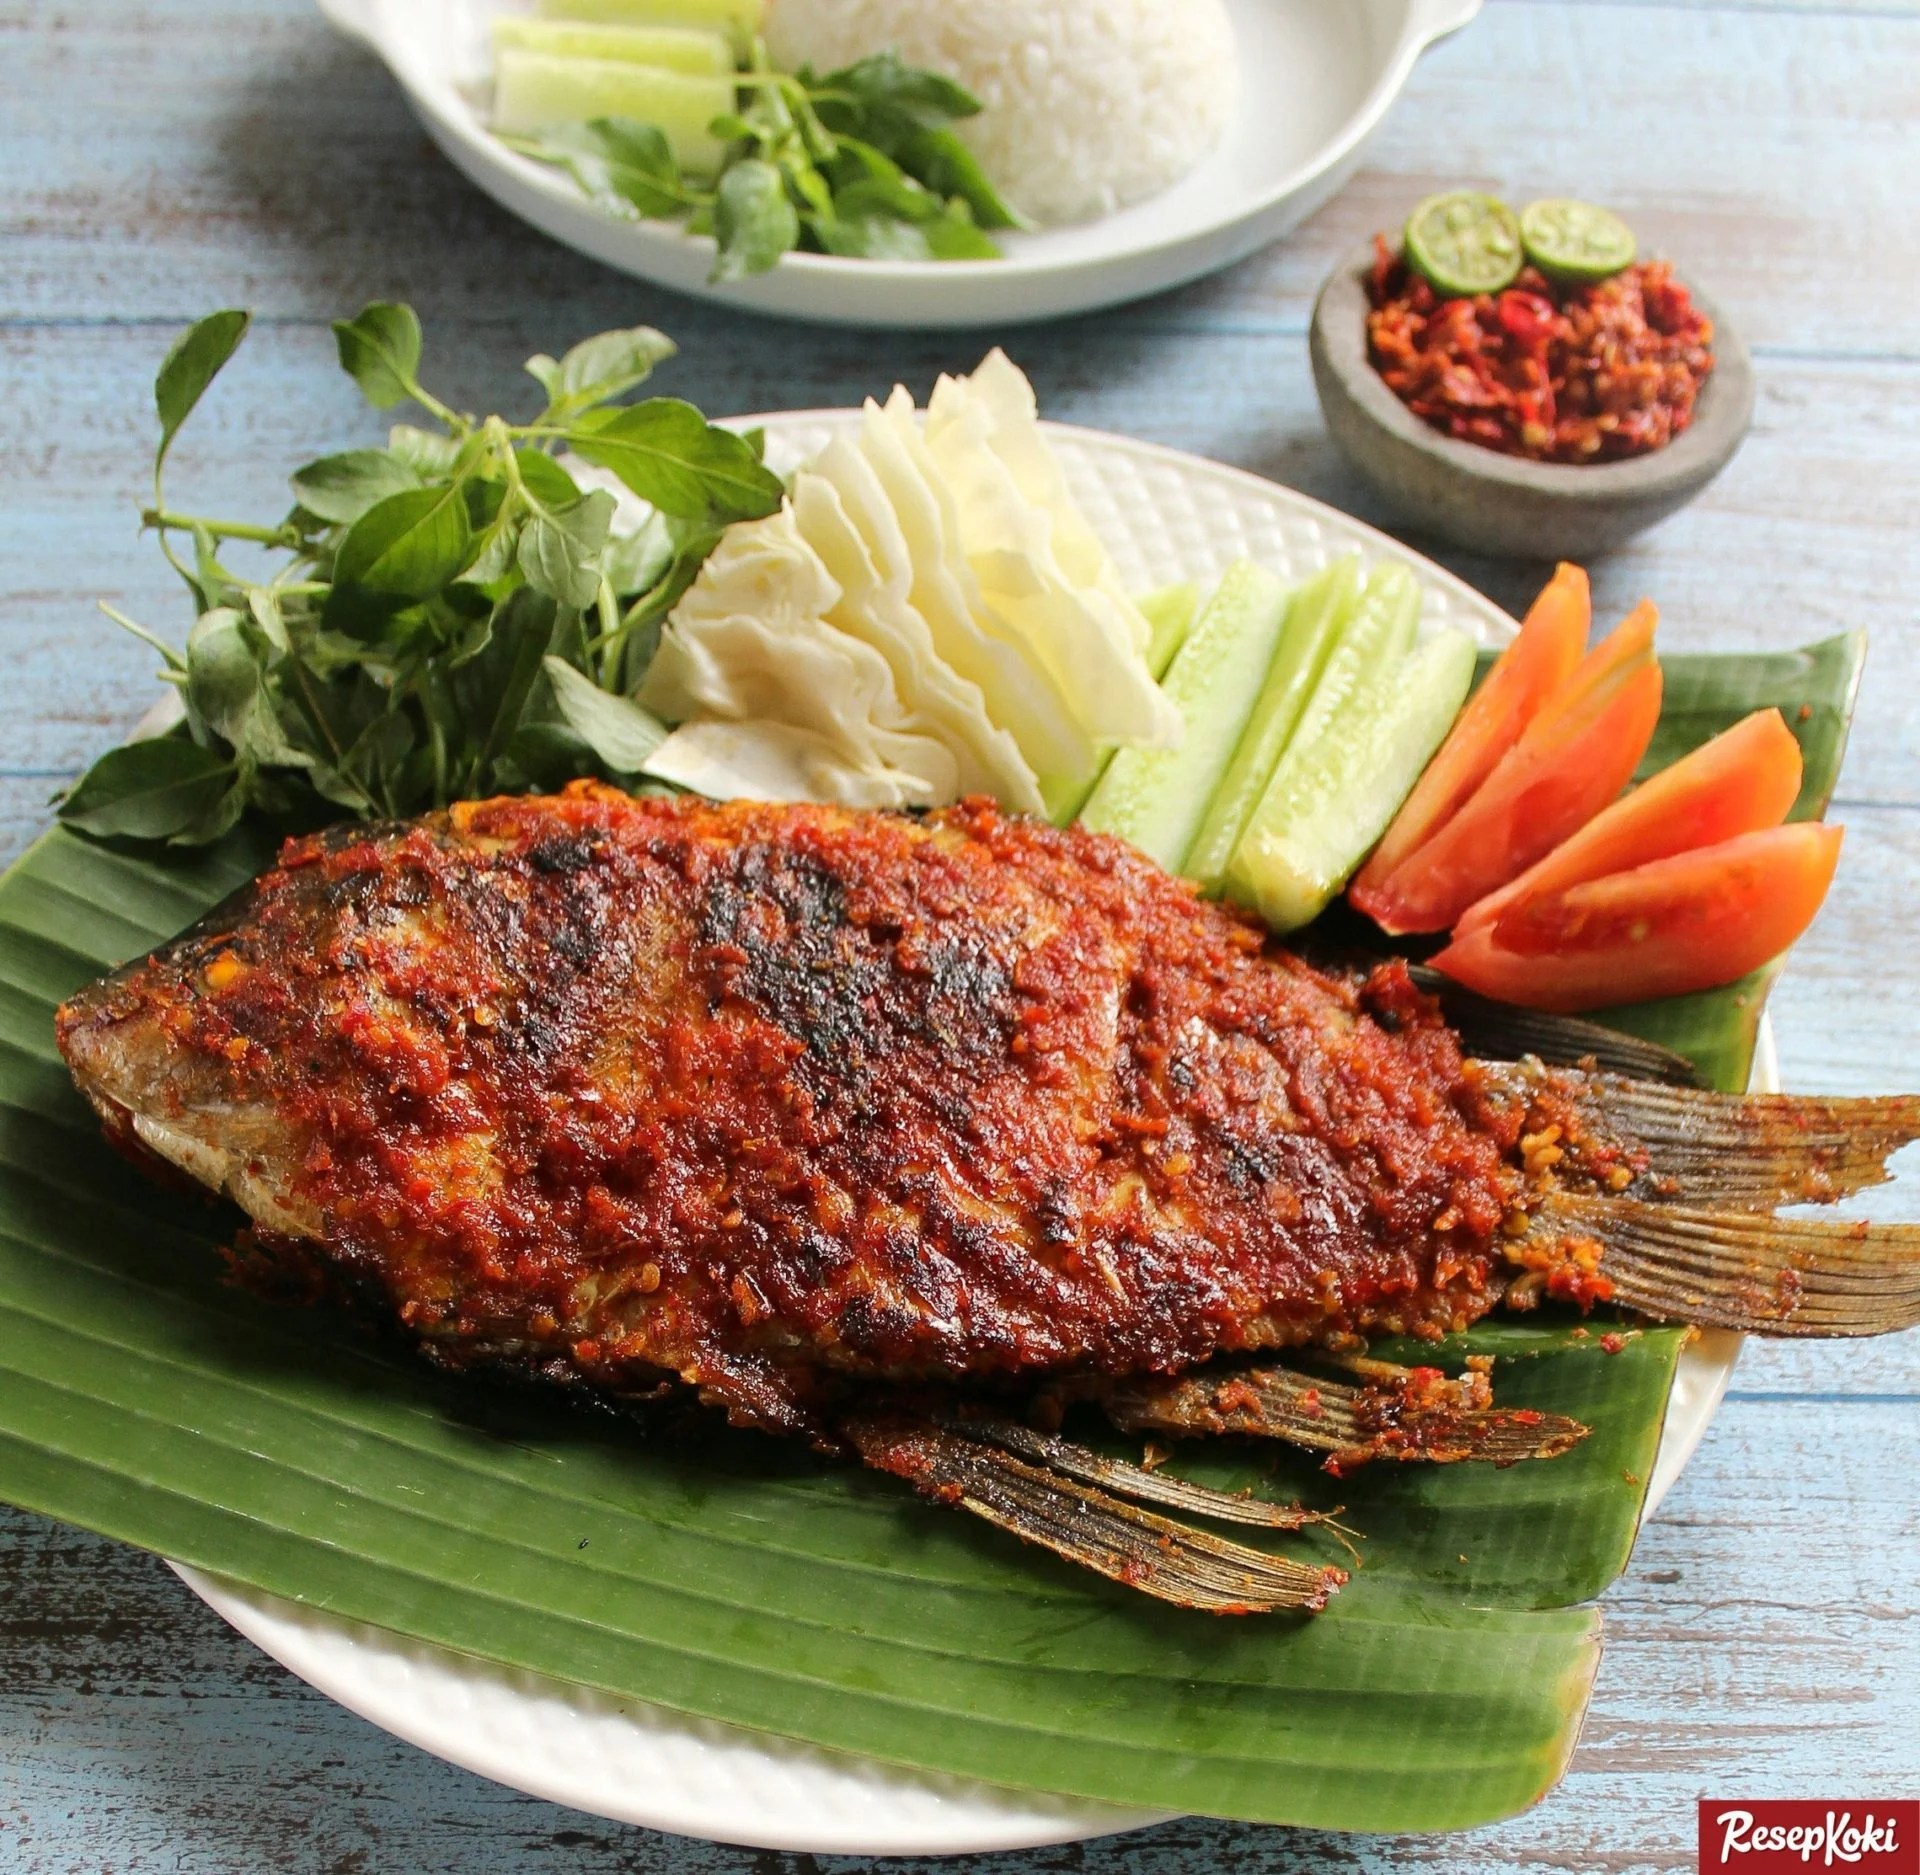 Ikan Gurame Bakar Bumbu Bali Pedas Istimewa - Resep | ResepKoki